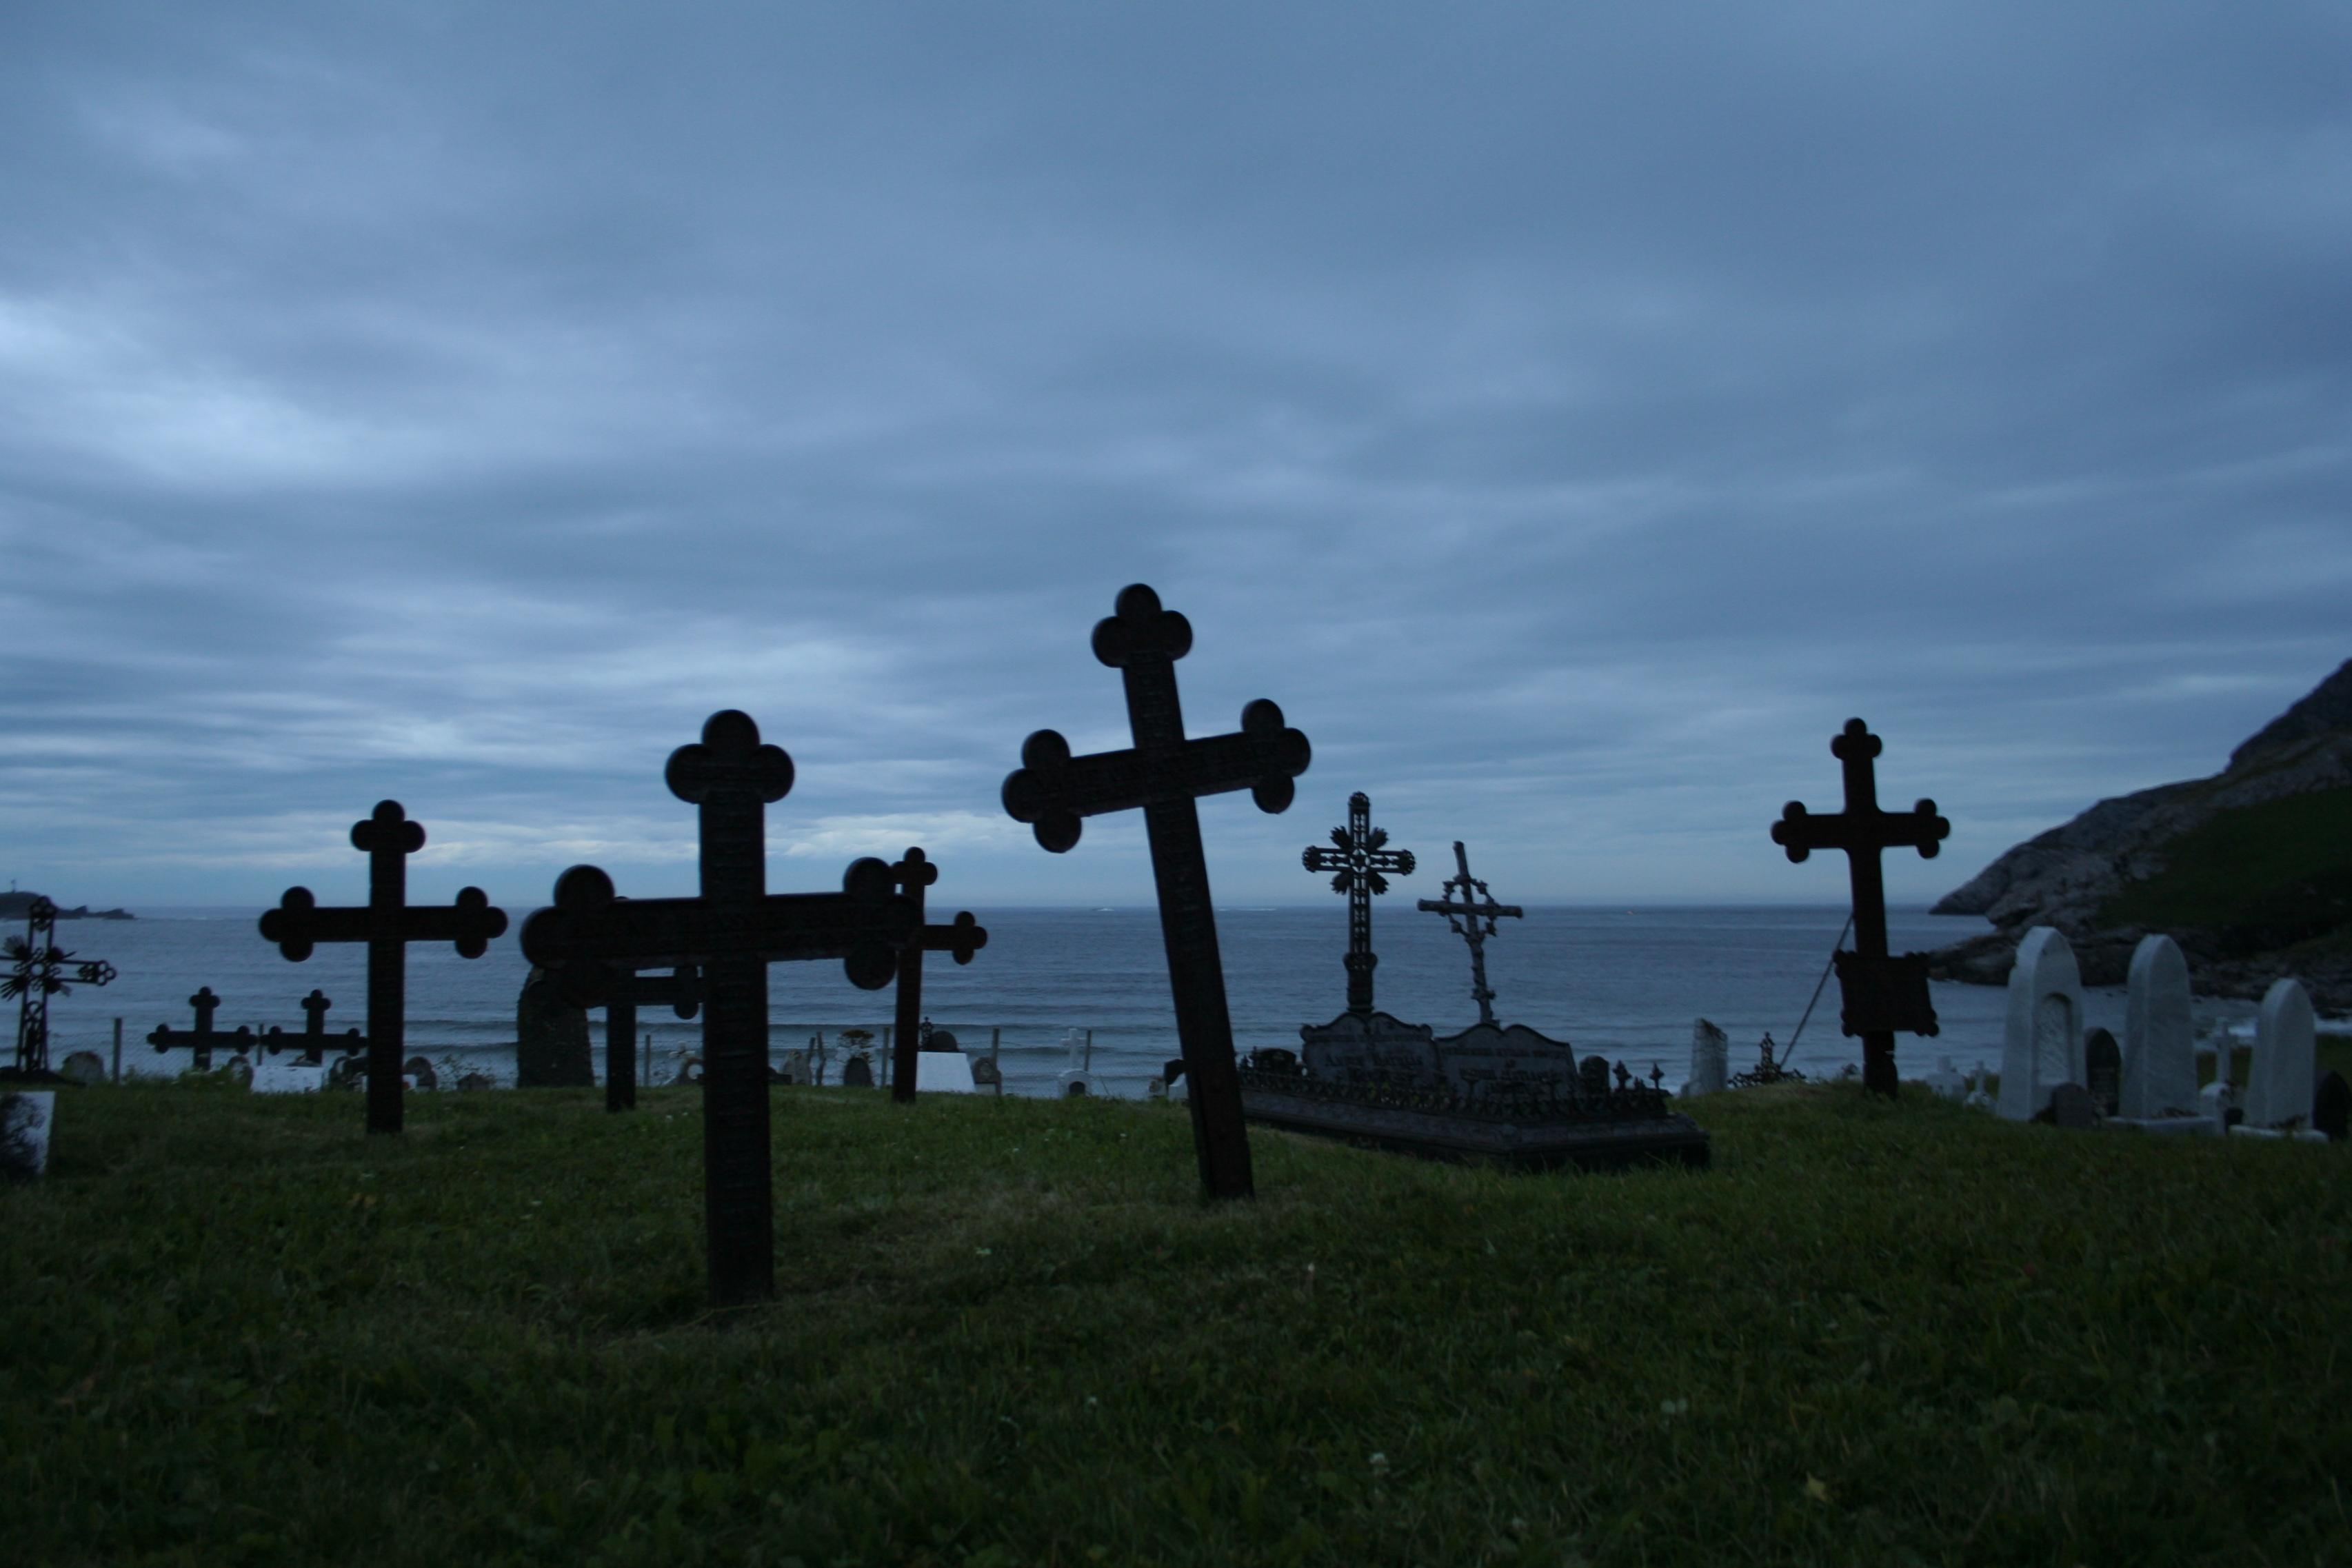 File:Ervik Graveyard Midnight.jpg - Wikimedia Commons